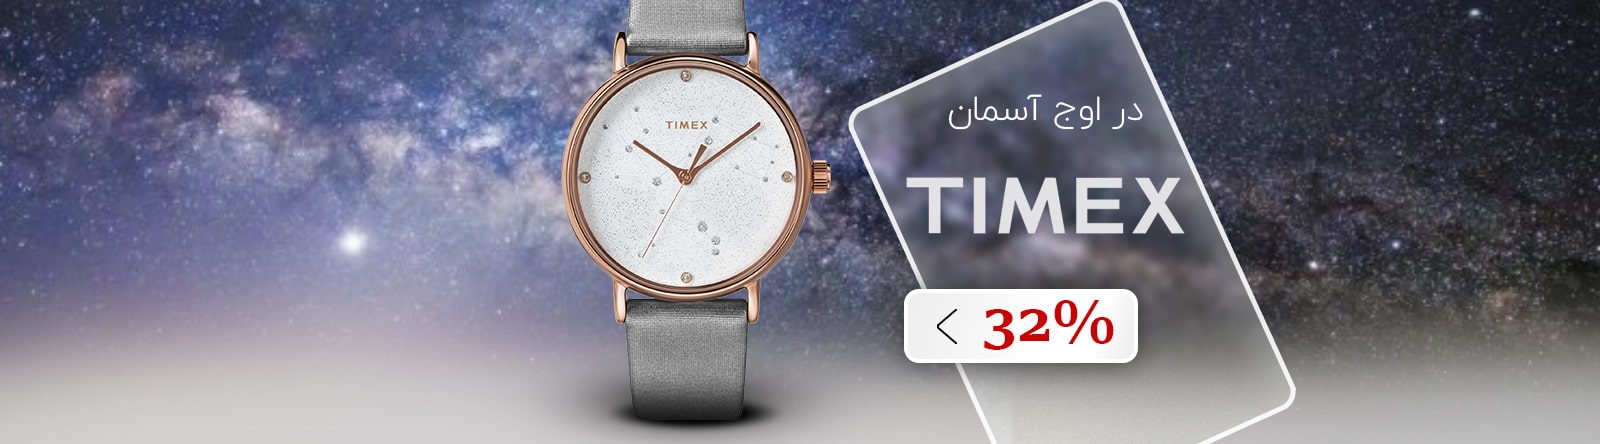 ساعت مچی تایمکس Timex